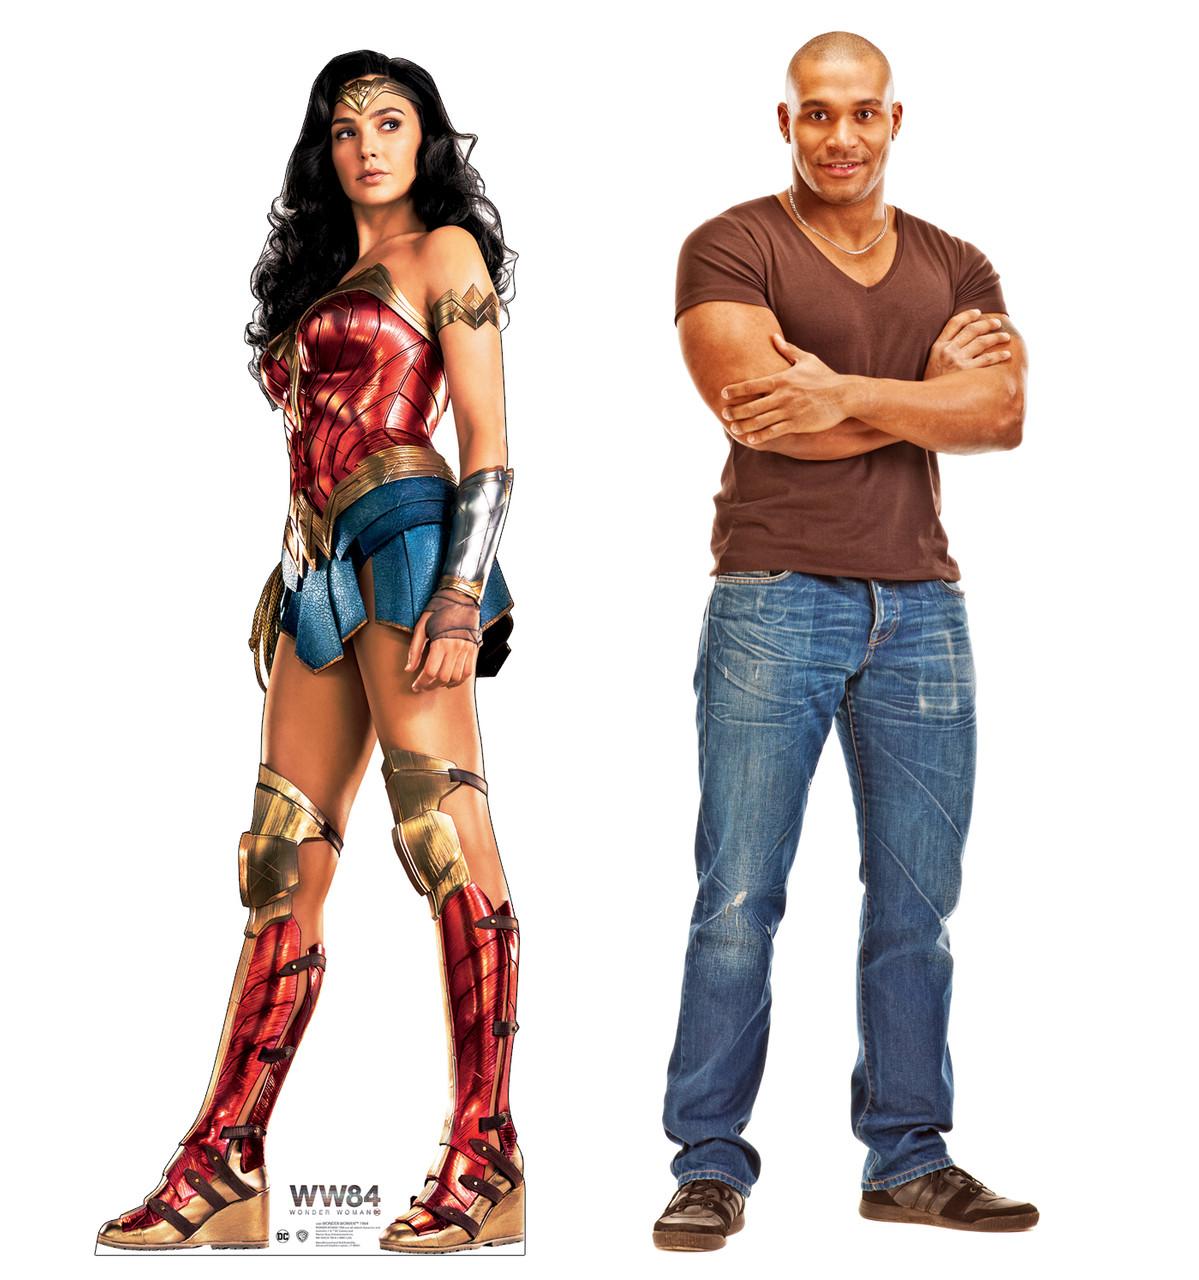 Wonder Woman 1984 cardboard standee with model.